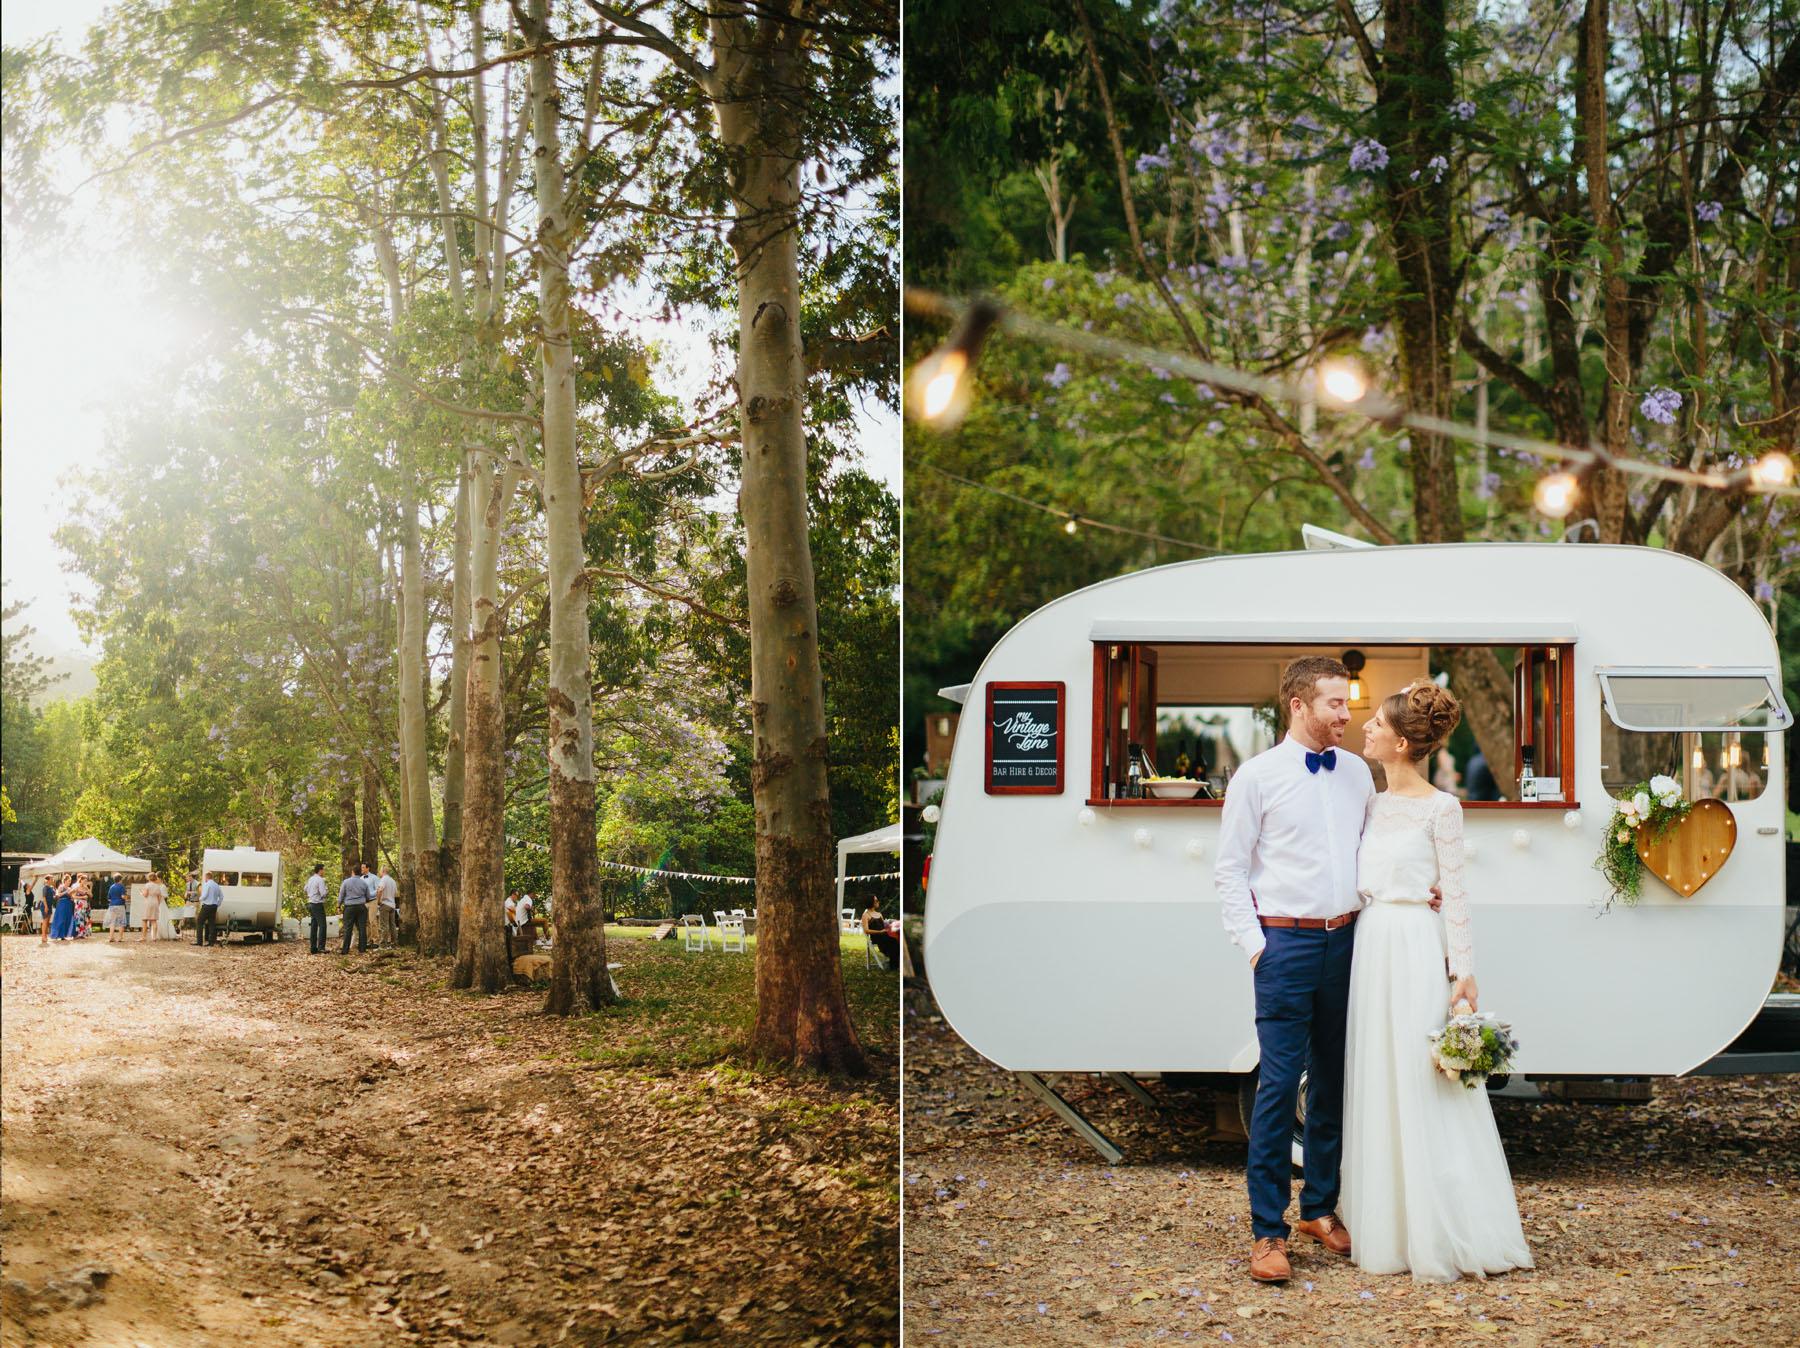 18_midginbill hill wedding .jpg